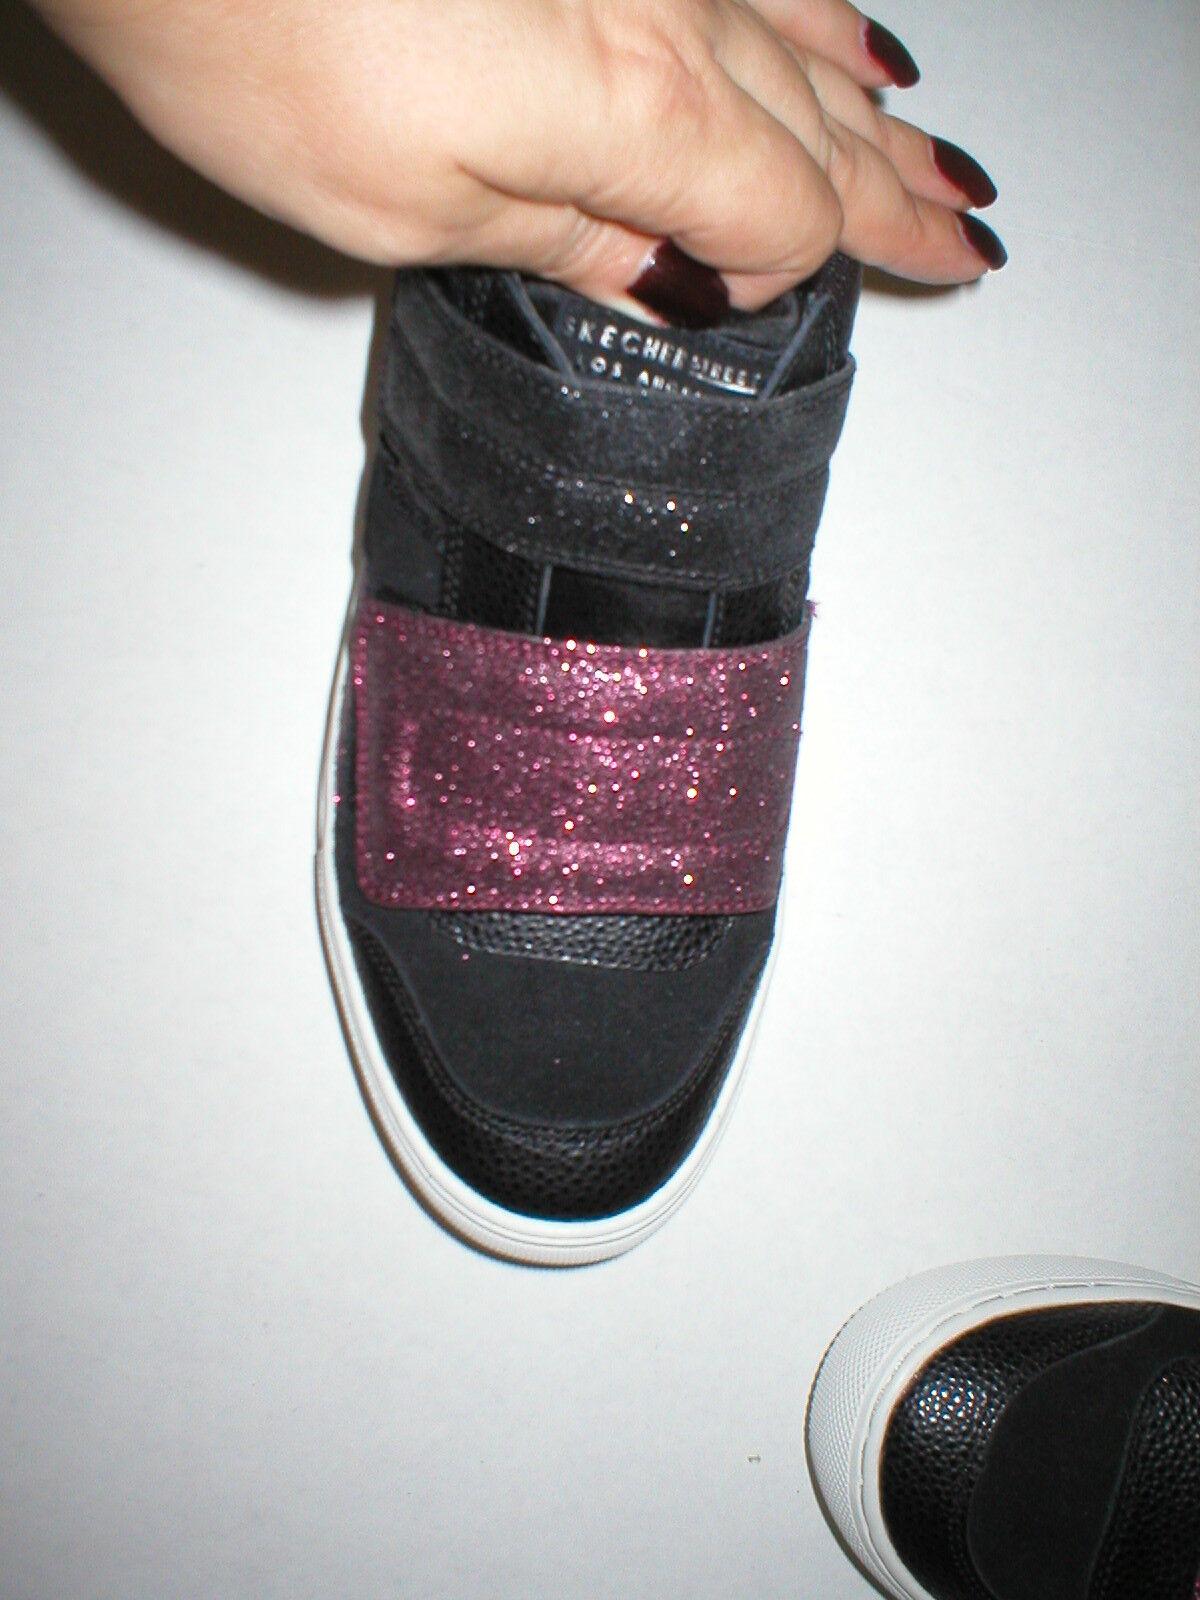 New Womens Glitter Glitter Glitter shoes Fashion Casual Sneakers 7 Black Pink Velcro Skechers 6cdd2c